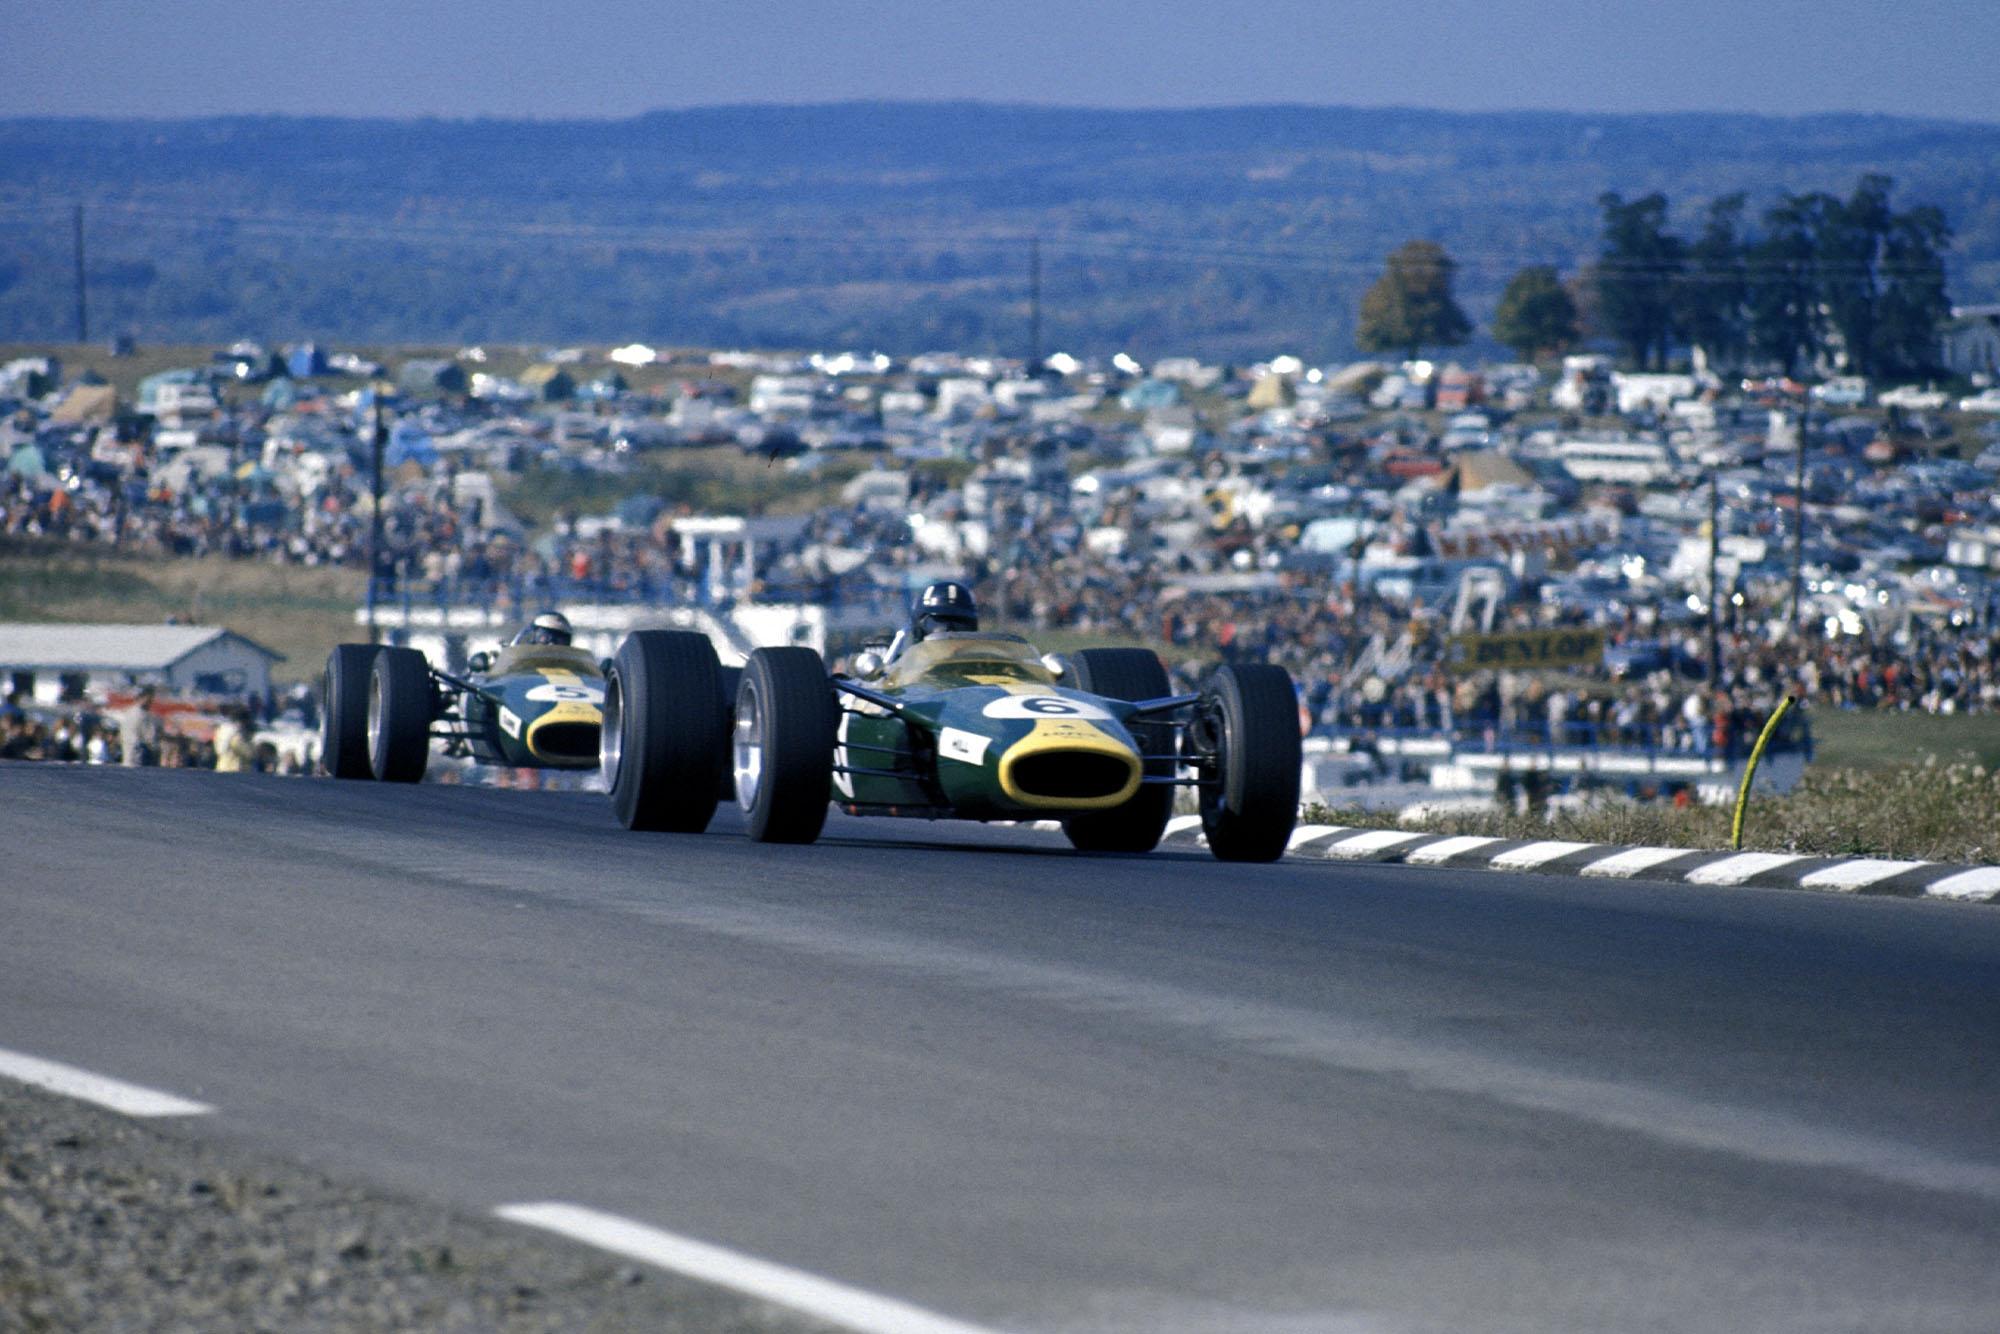 Graham Hill (GBR) Lotus Ford 49, leads team mate Jim Clark (GBR). Formula One World Championship, Rd10, United States Grand Prix, Watkins Glen, USA. 1 October 1967.